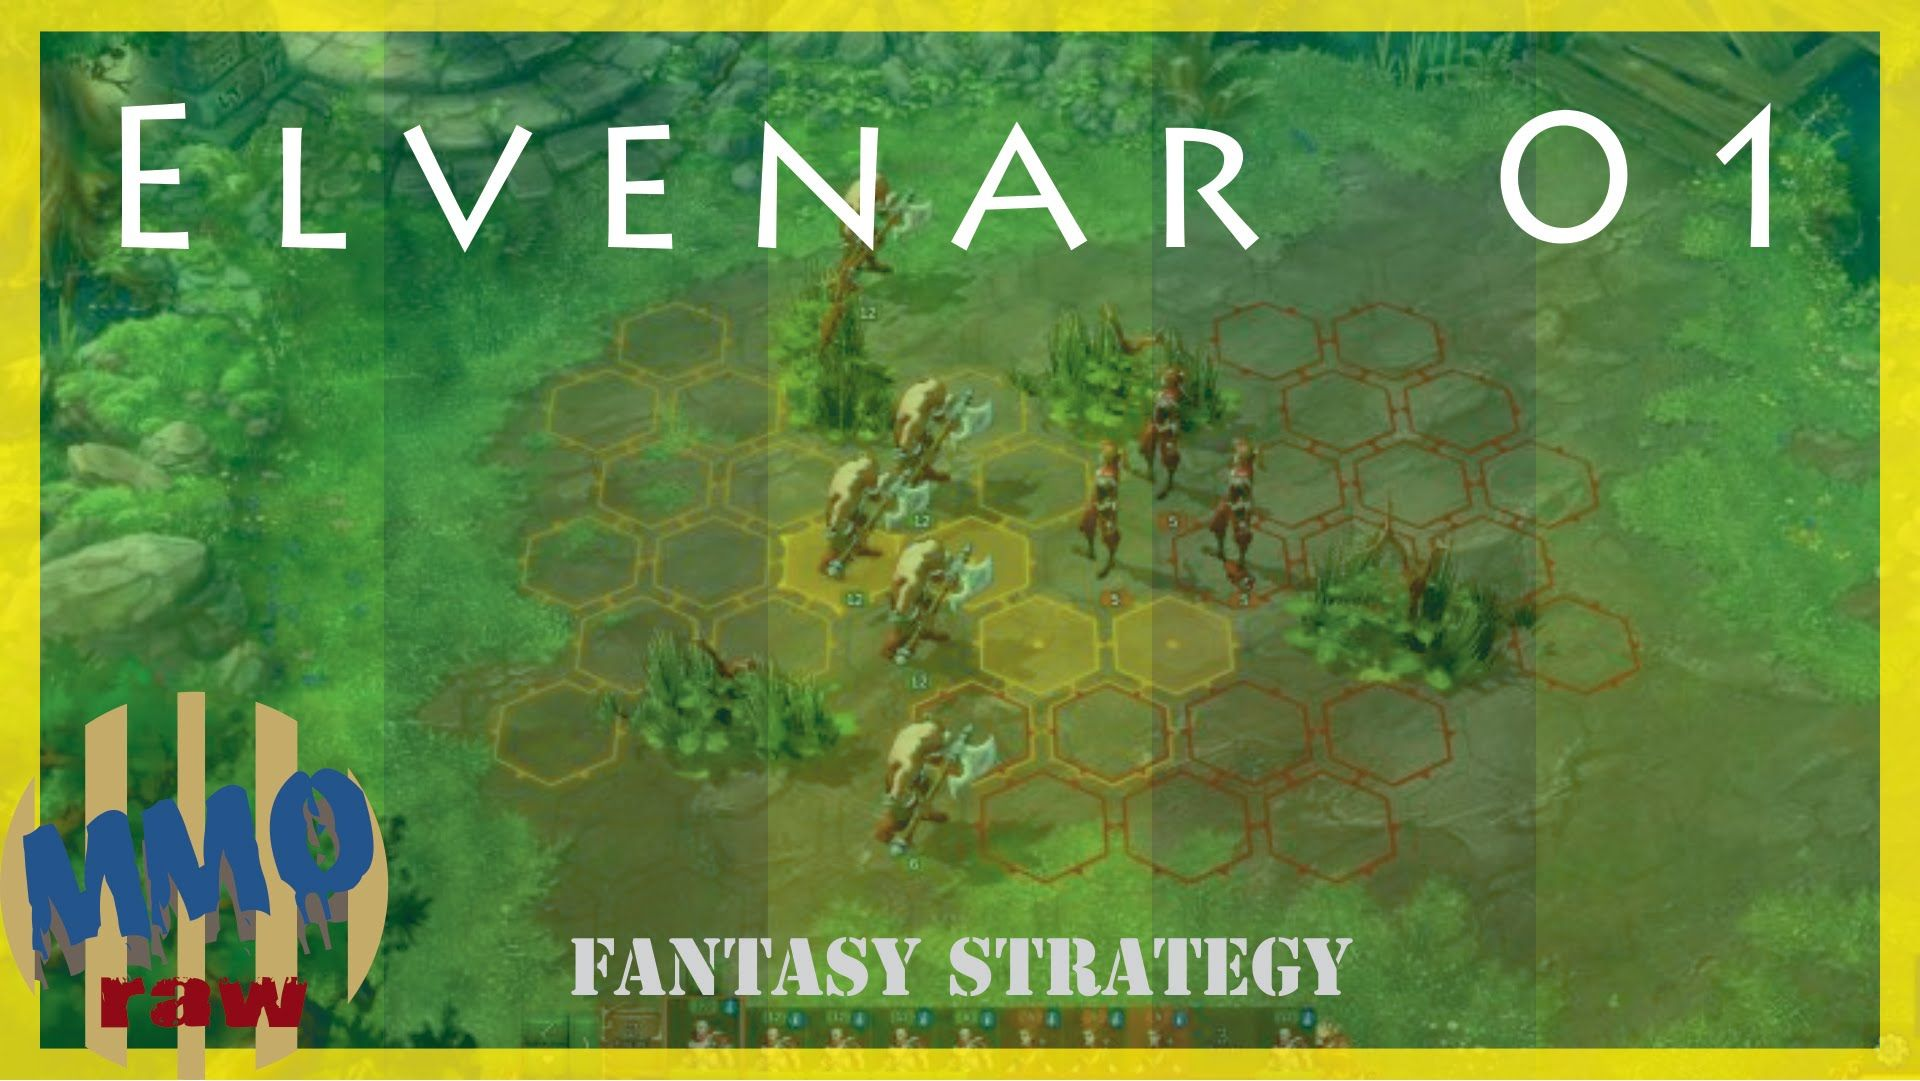 Elvenar Fantasy strategy 1 Elvenar is a BB [Browser